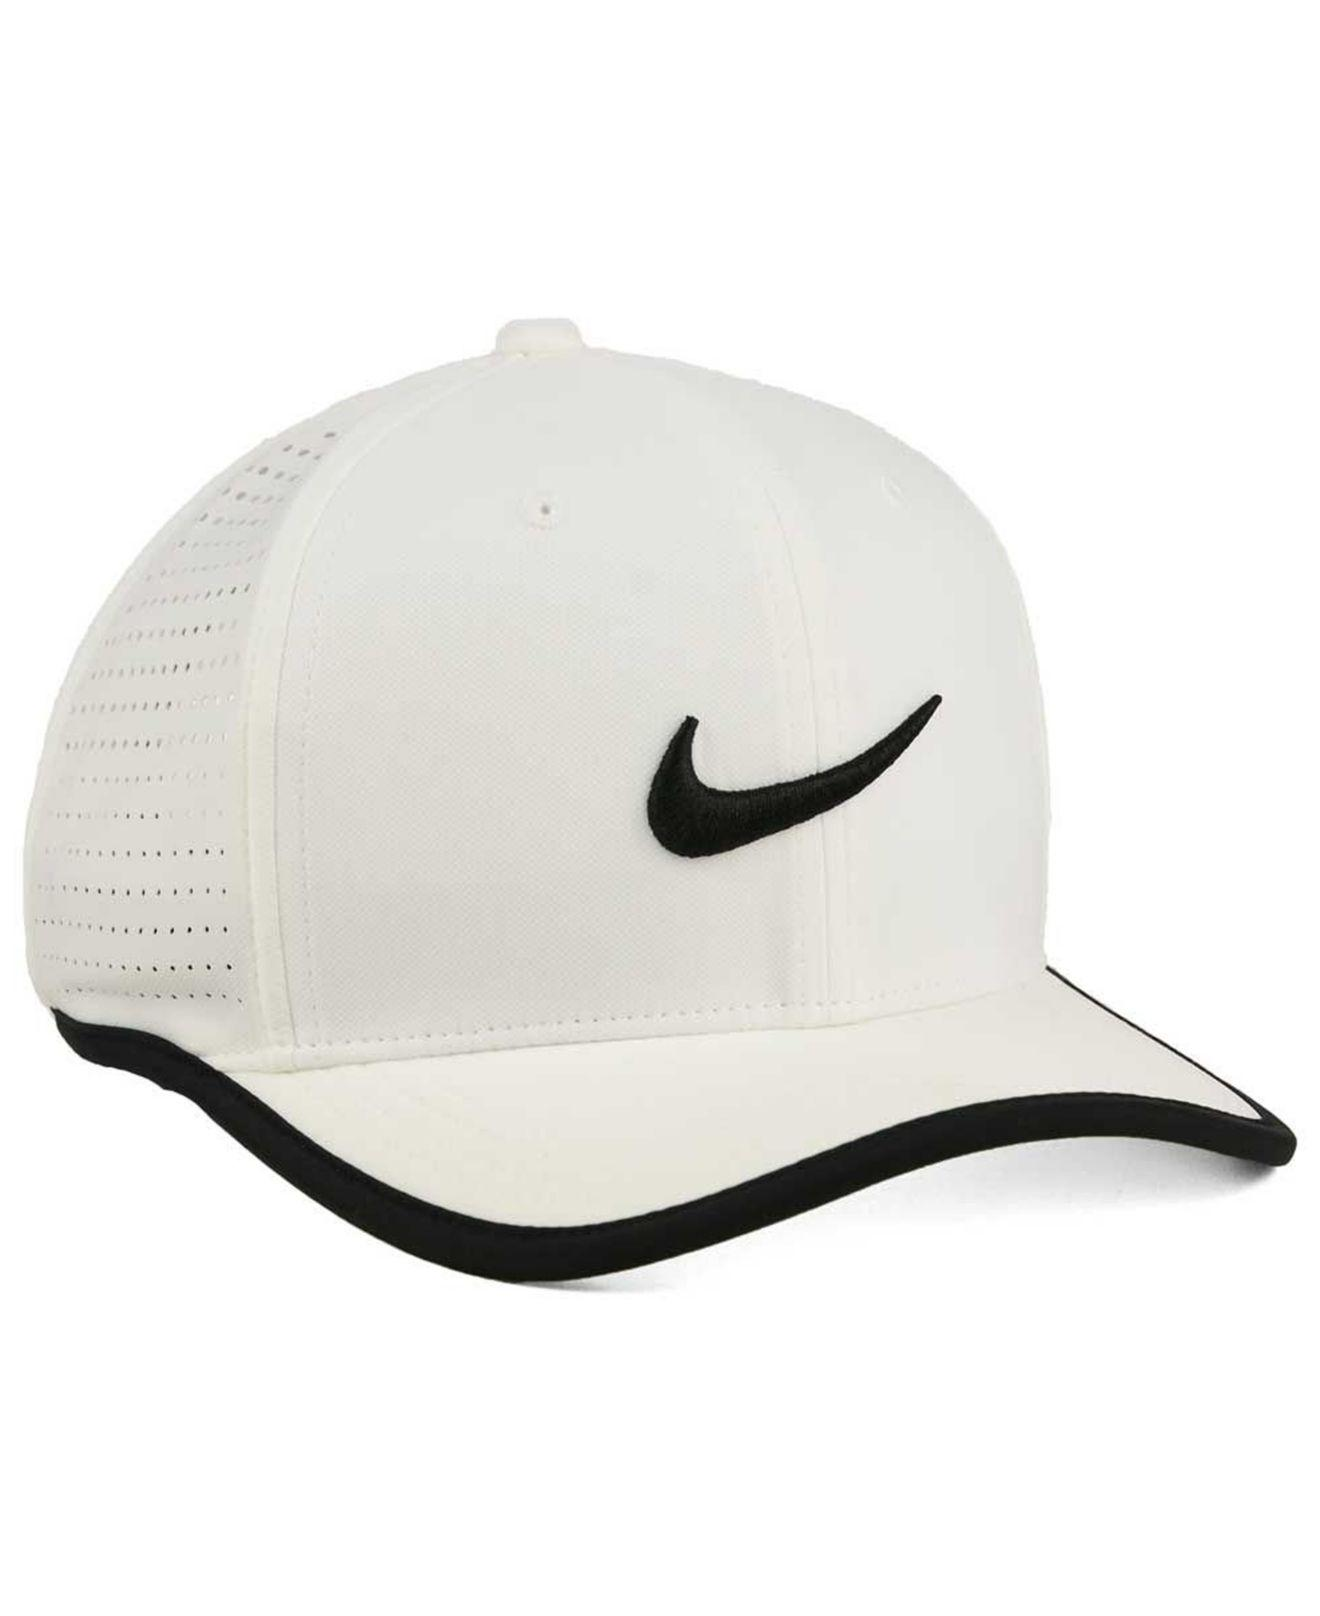 c0f74419b8c57 ... order lyst nike vapor adjustable ii cap in white for men b7cc7 707d5